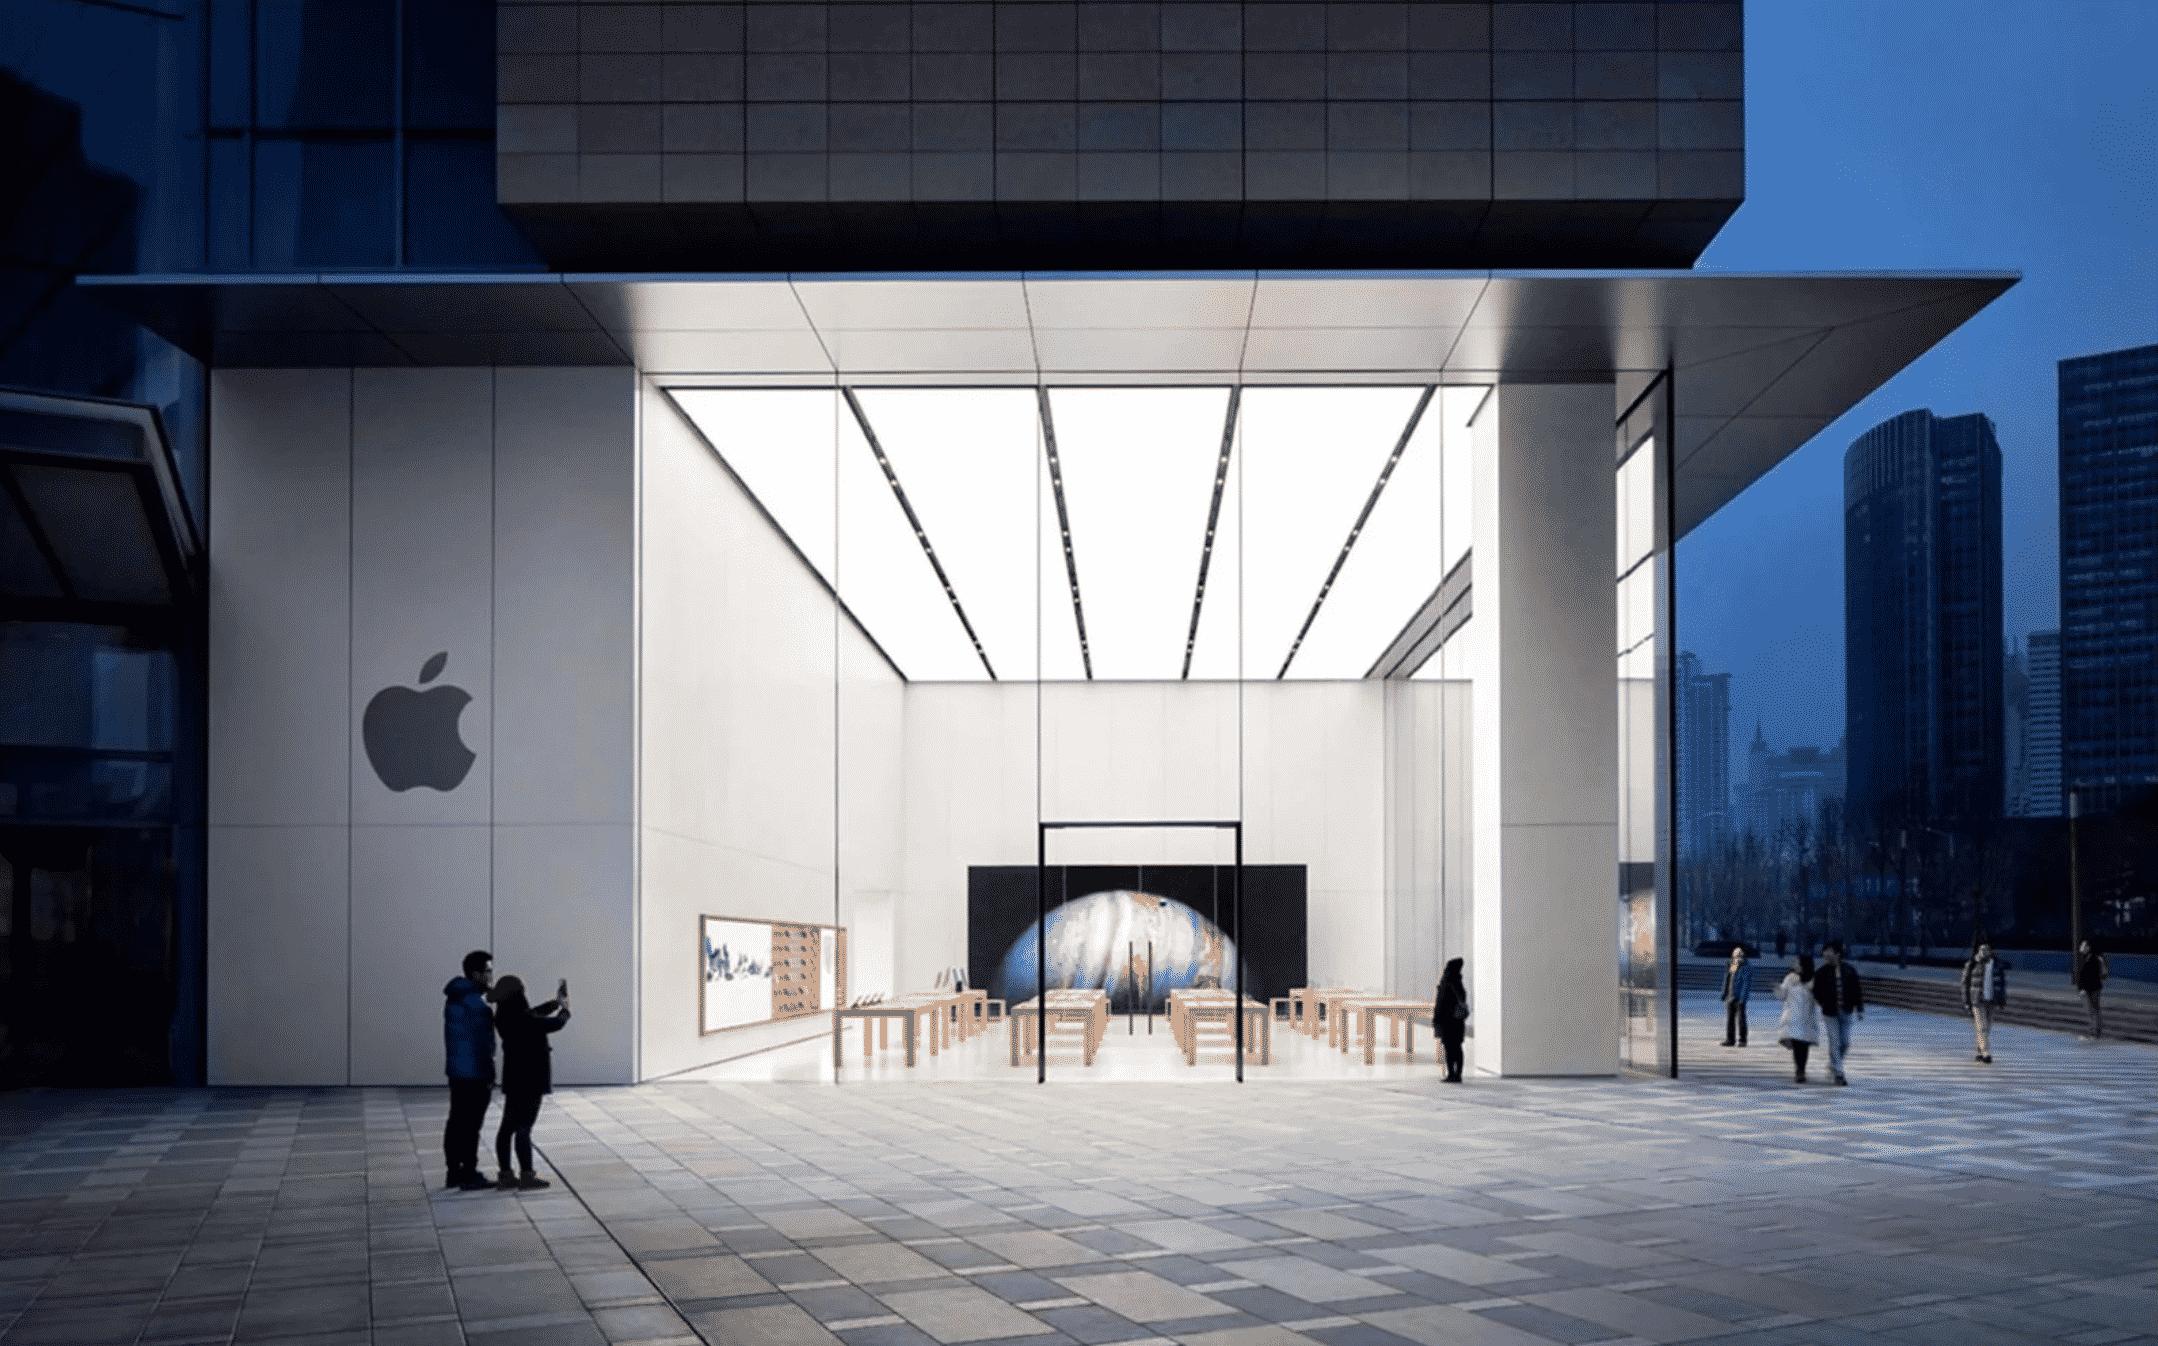 Apple Stores in China Closed Due to Coronavirus